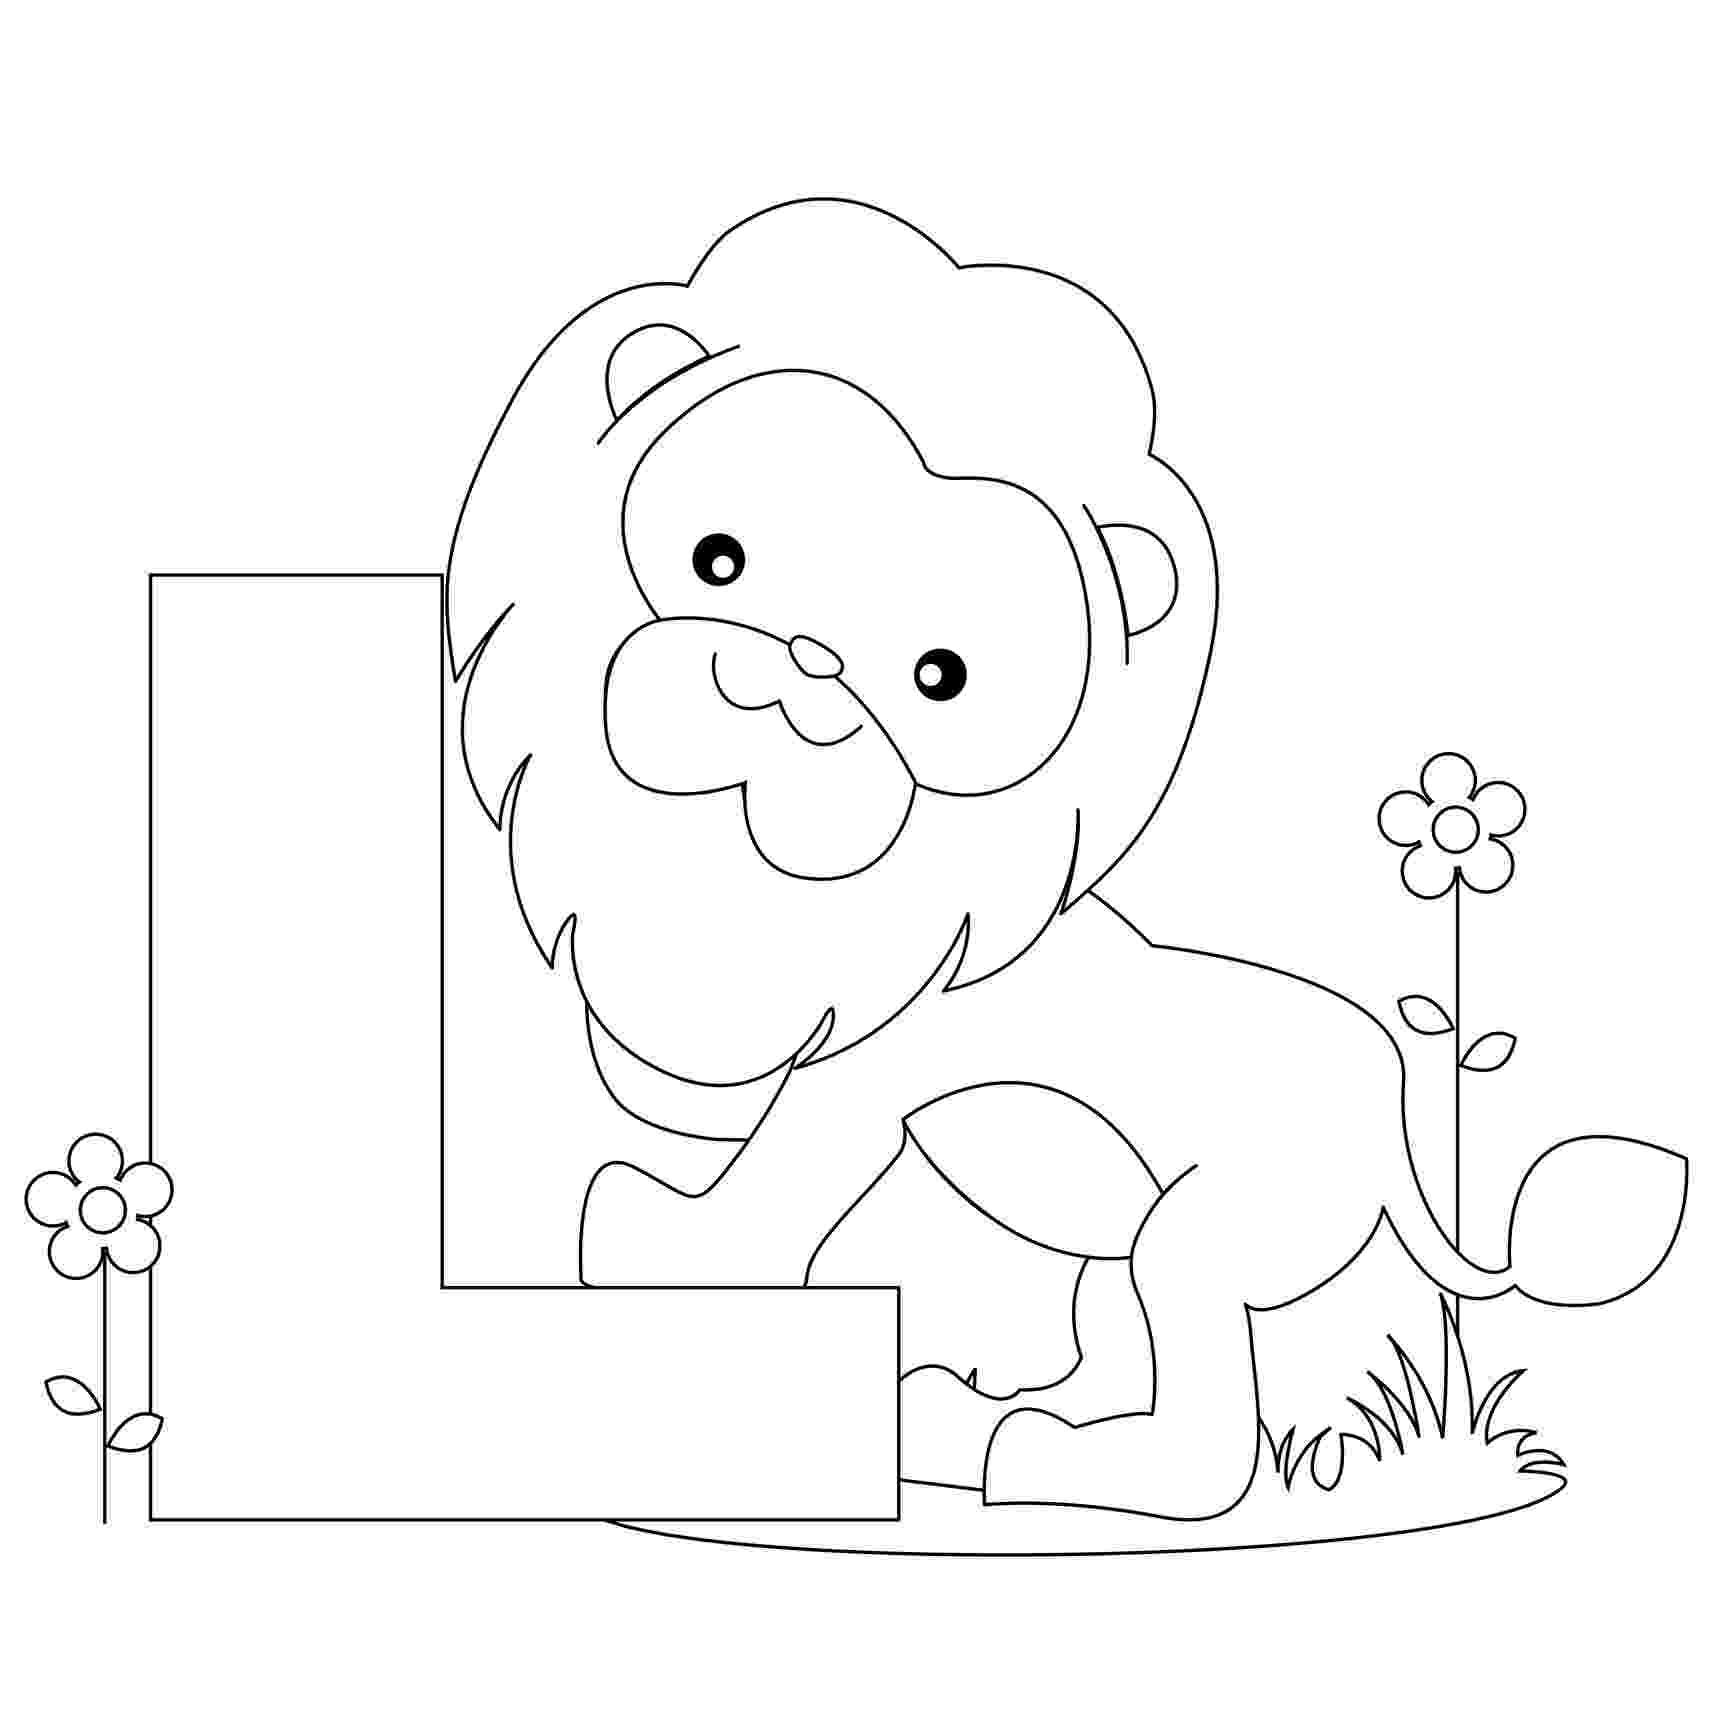 coloring pages letter l letter l is for ladybug coloring page free printable coloring pages letter l